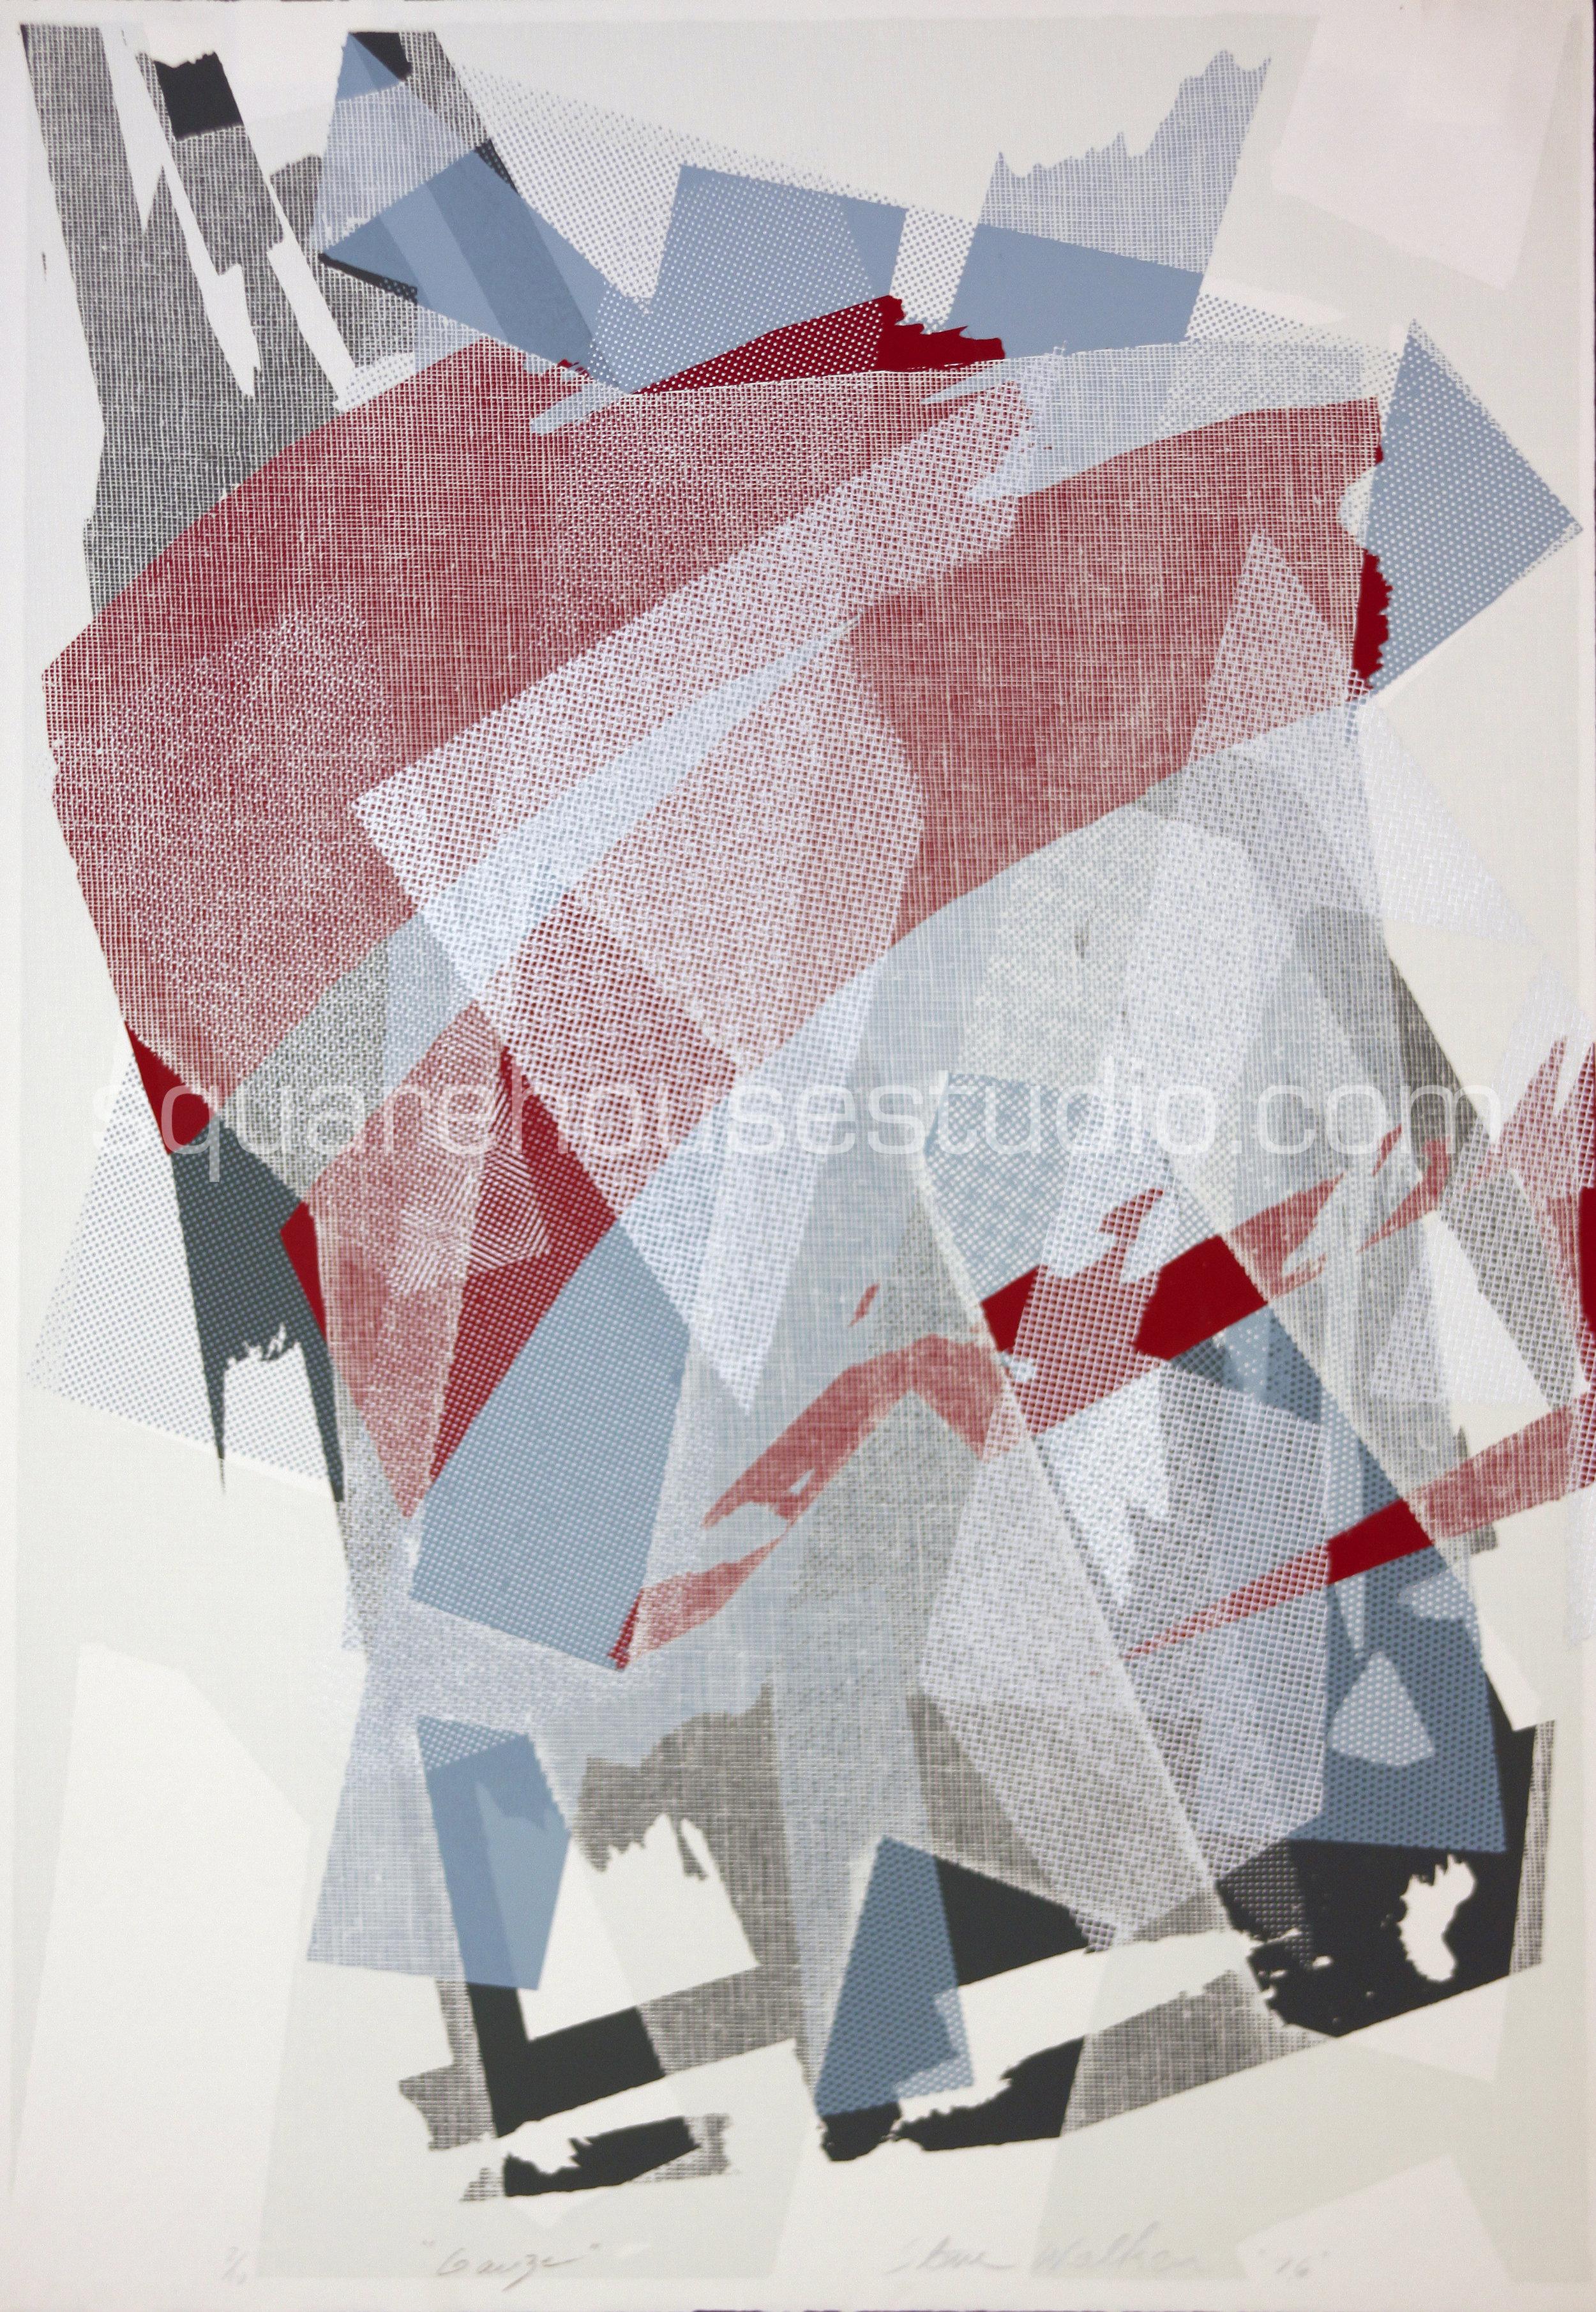 "Gauze , 22"" x 32,"" original edition, $625 framed / $475 unframed, Available as giclée print—$450 framed / $300 unframed"